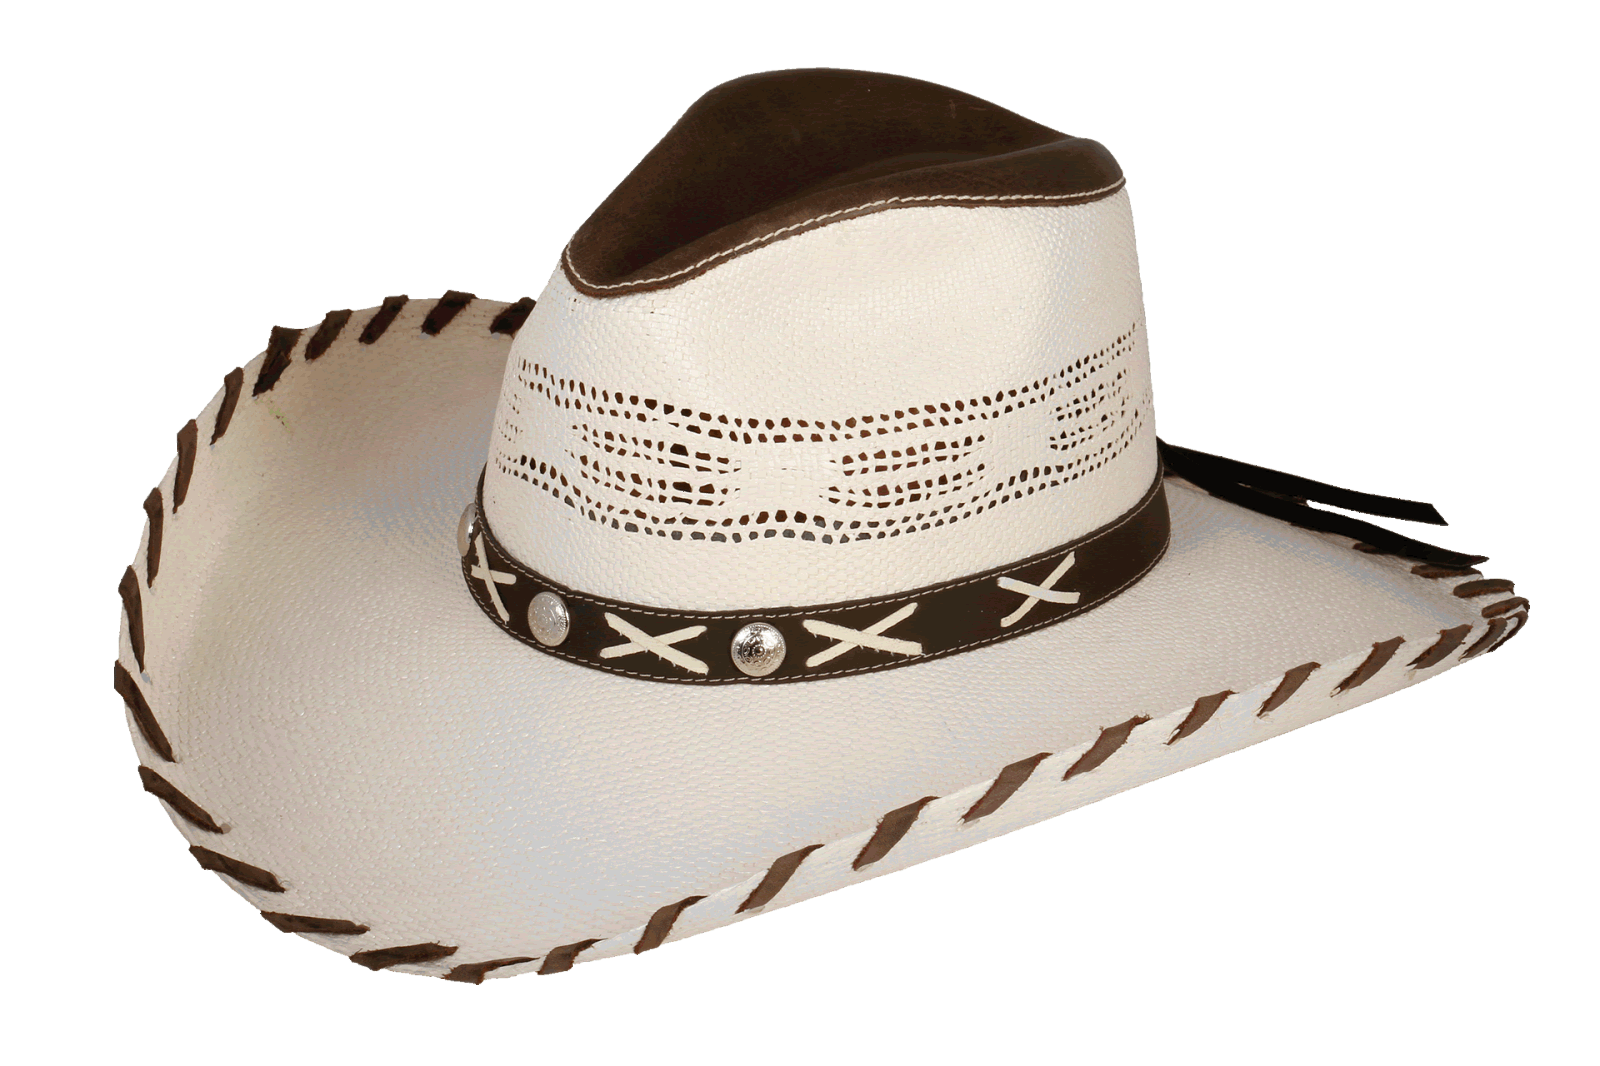 Mexicano Bangora Shantung